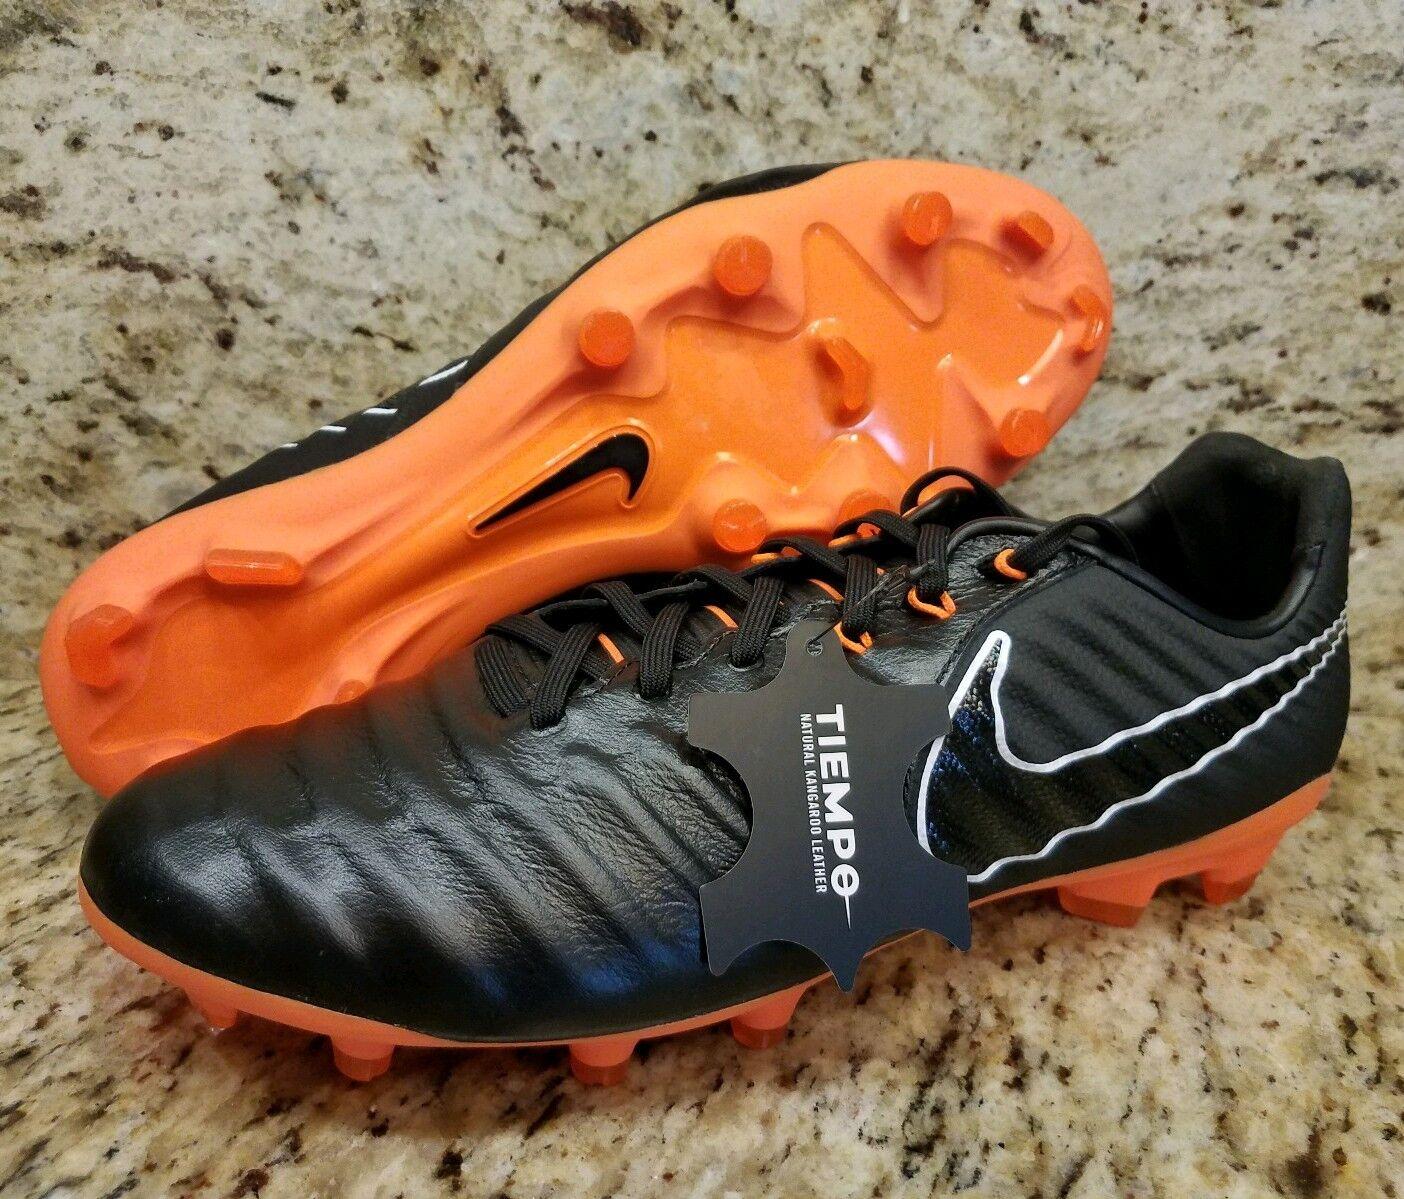 Nike tiempo 7 legende 7 tiempo vii - fg schwarz - orange insgesamt 11,5 ah7241-080 neue  sz b04684